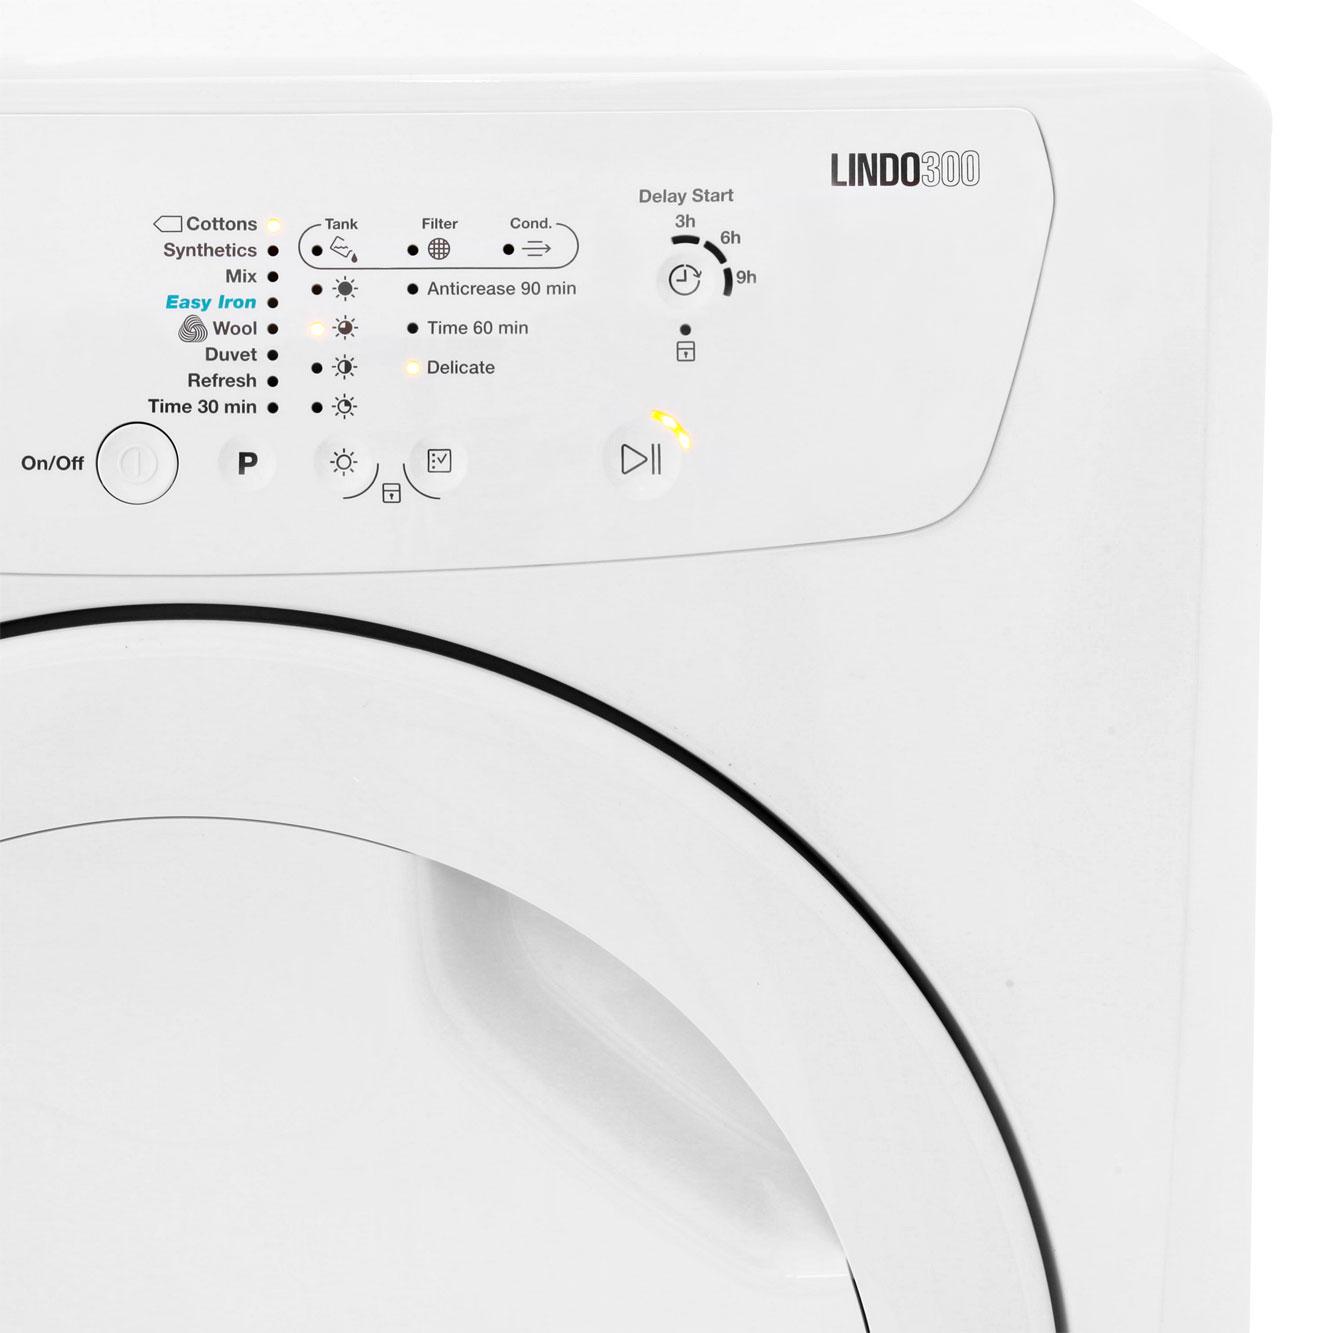 Zanussi Lindo300 Condenser Tumble Dryer Zdc8202p Ao